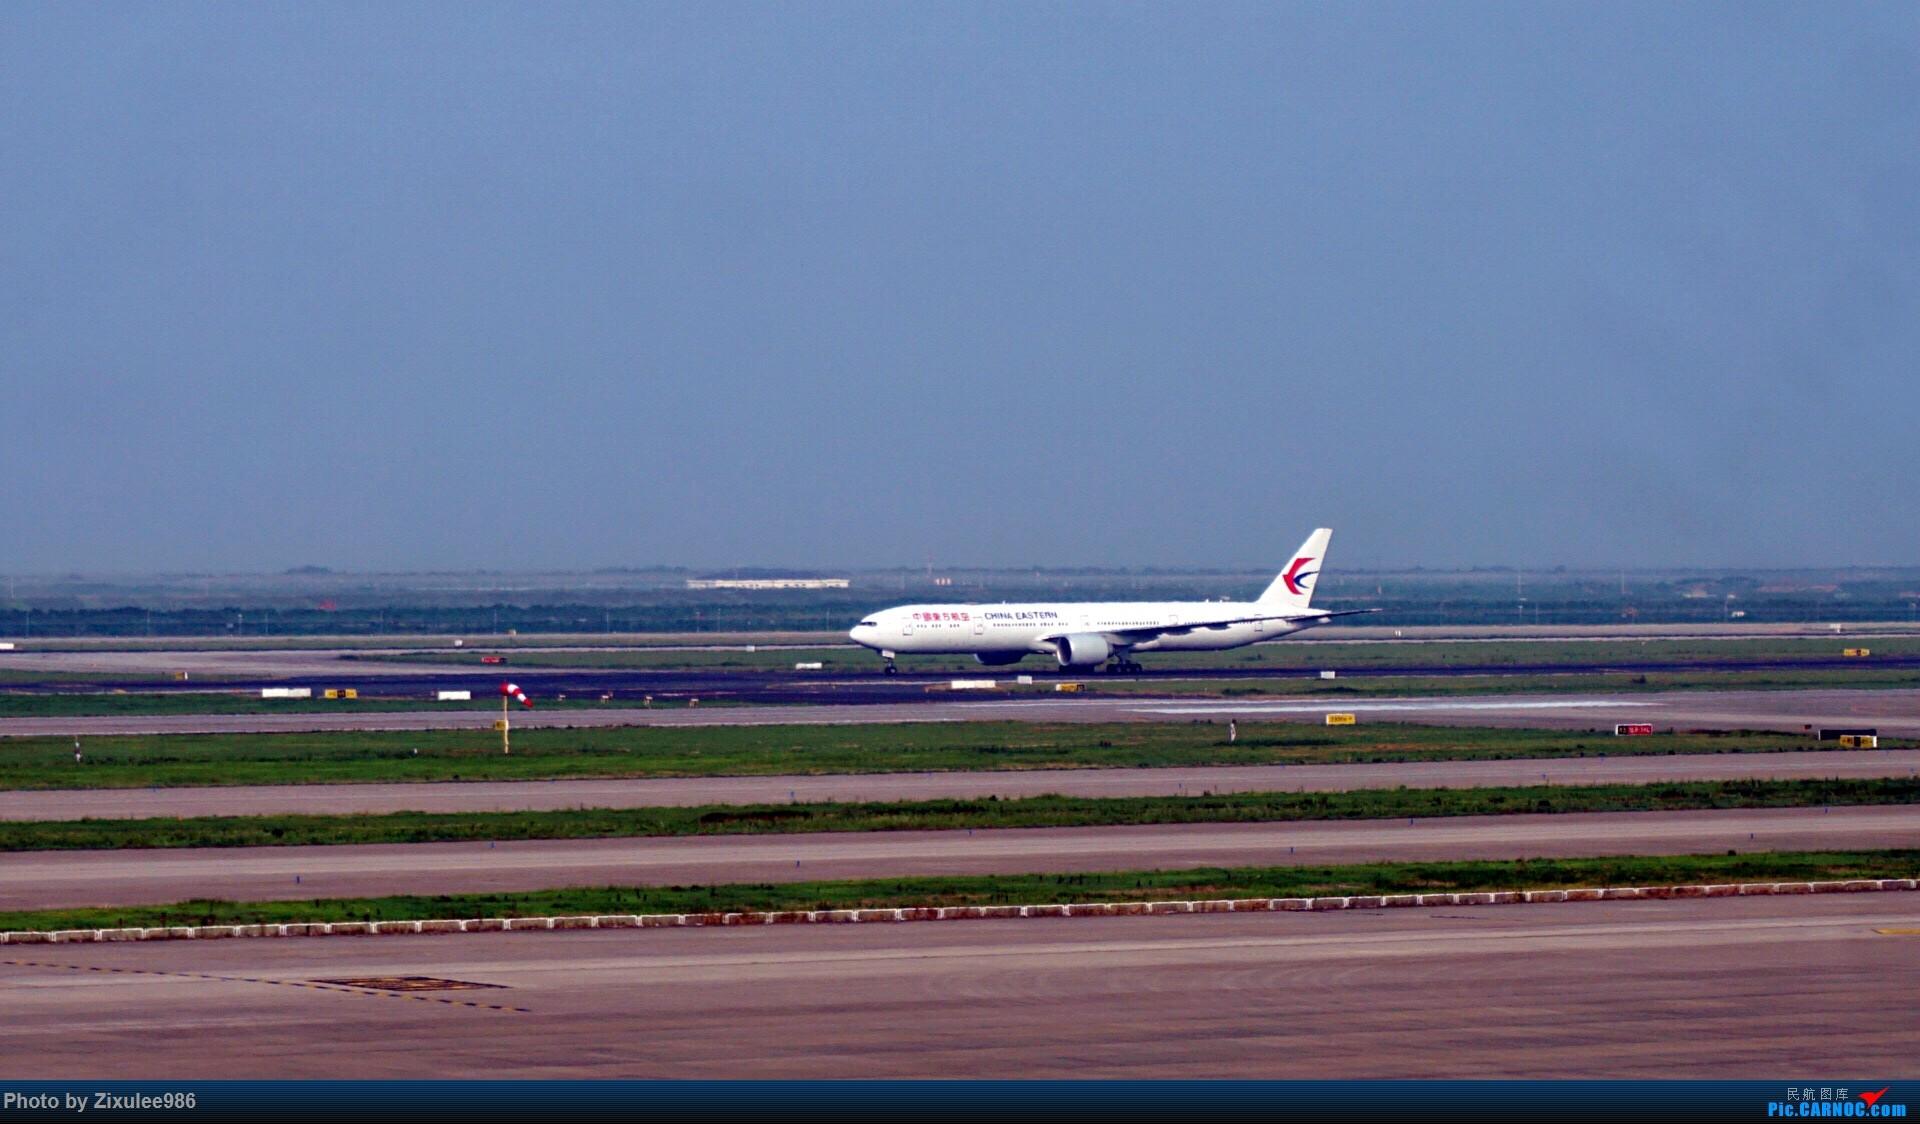 Re:加拿大21日游学之旅(一)~JJN-PVG-YYZ..(内含flightlog)~第一次发游记~多图缓更请谅解 BOEING 777-39P (ER) B-2023 中国上海浦东国际机场